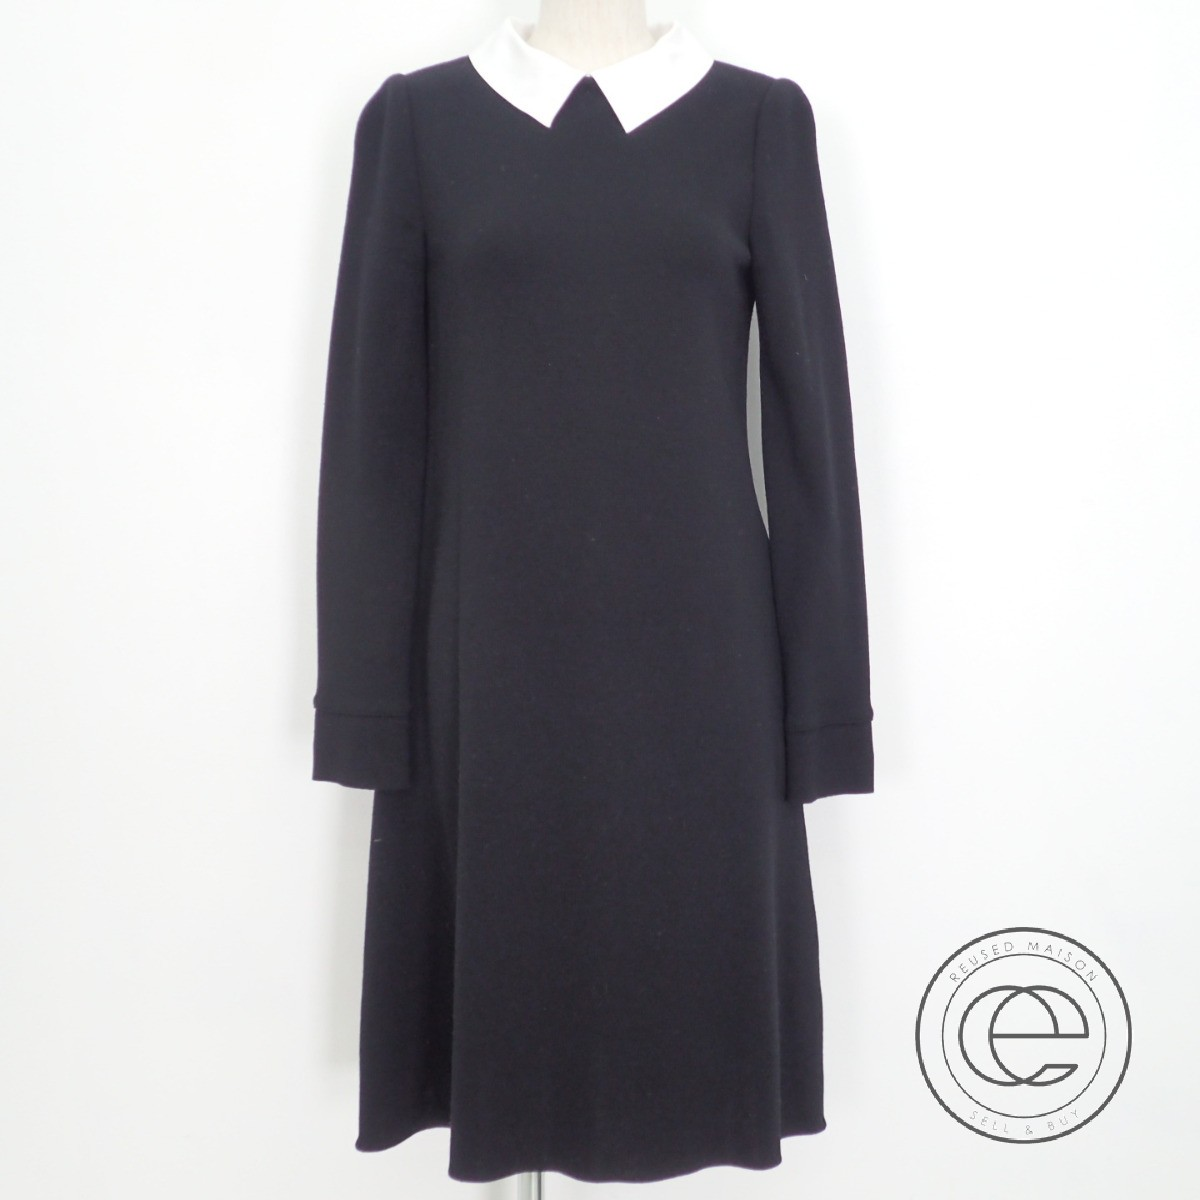 FOXEYフォクシー 17年製 37125 Knit Dress Marion 白襟付 ウール ニットワンピース40 ブラック レディース 【中古】